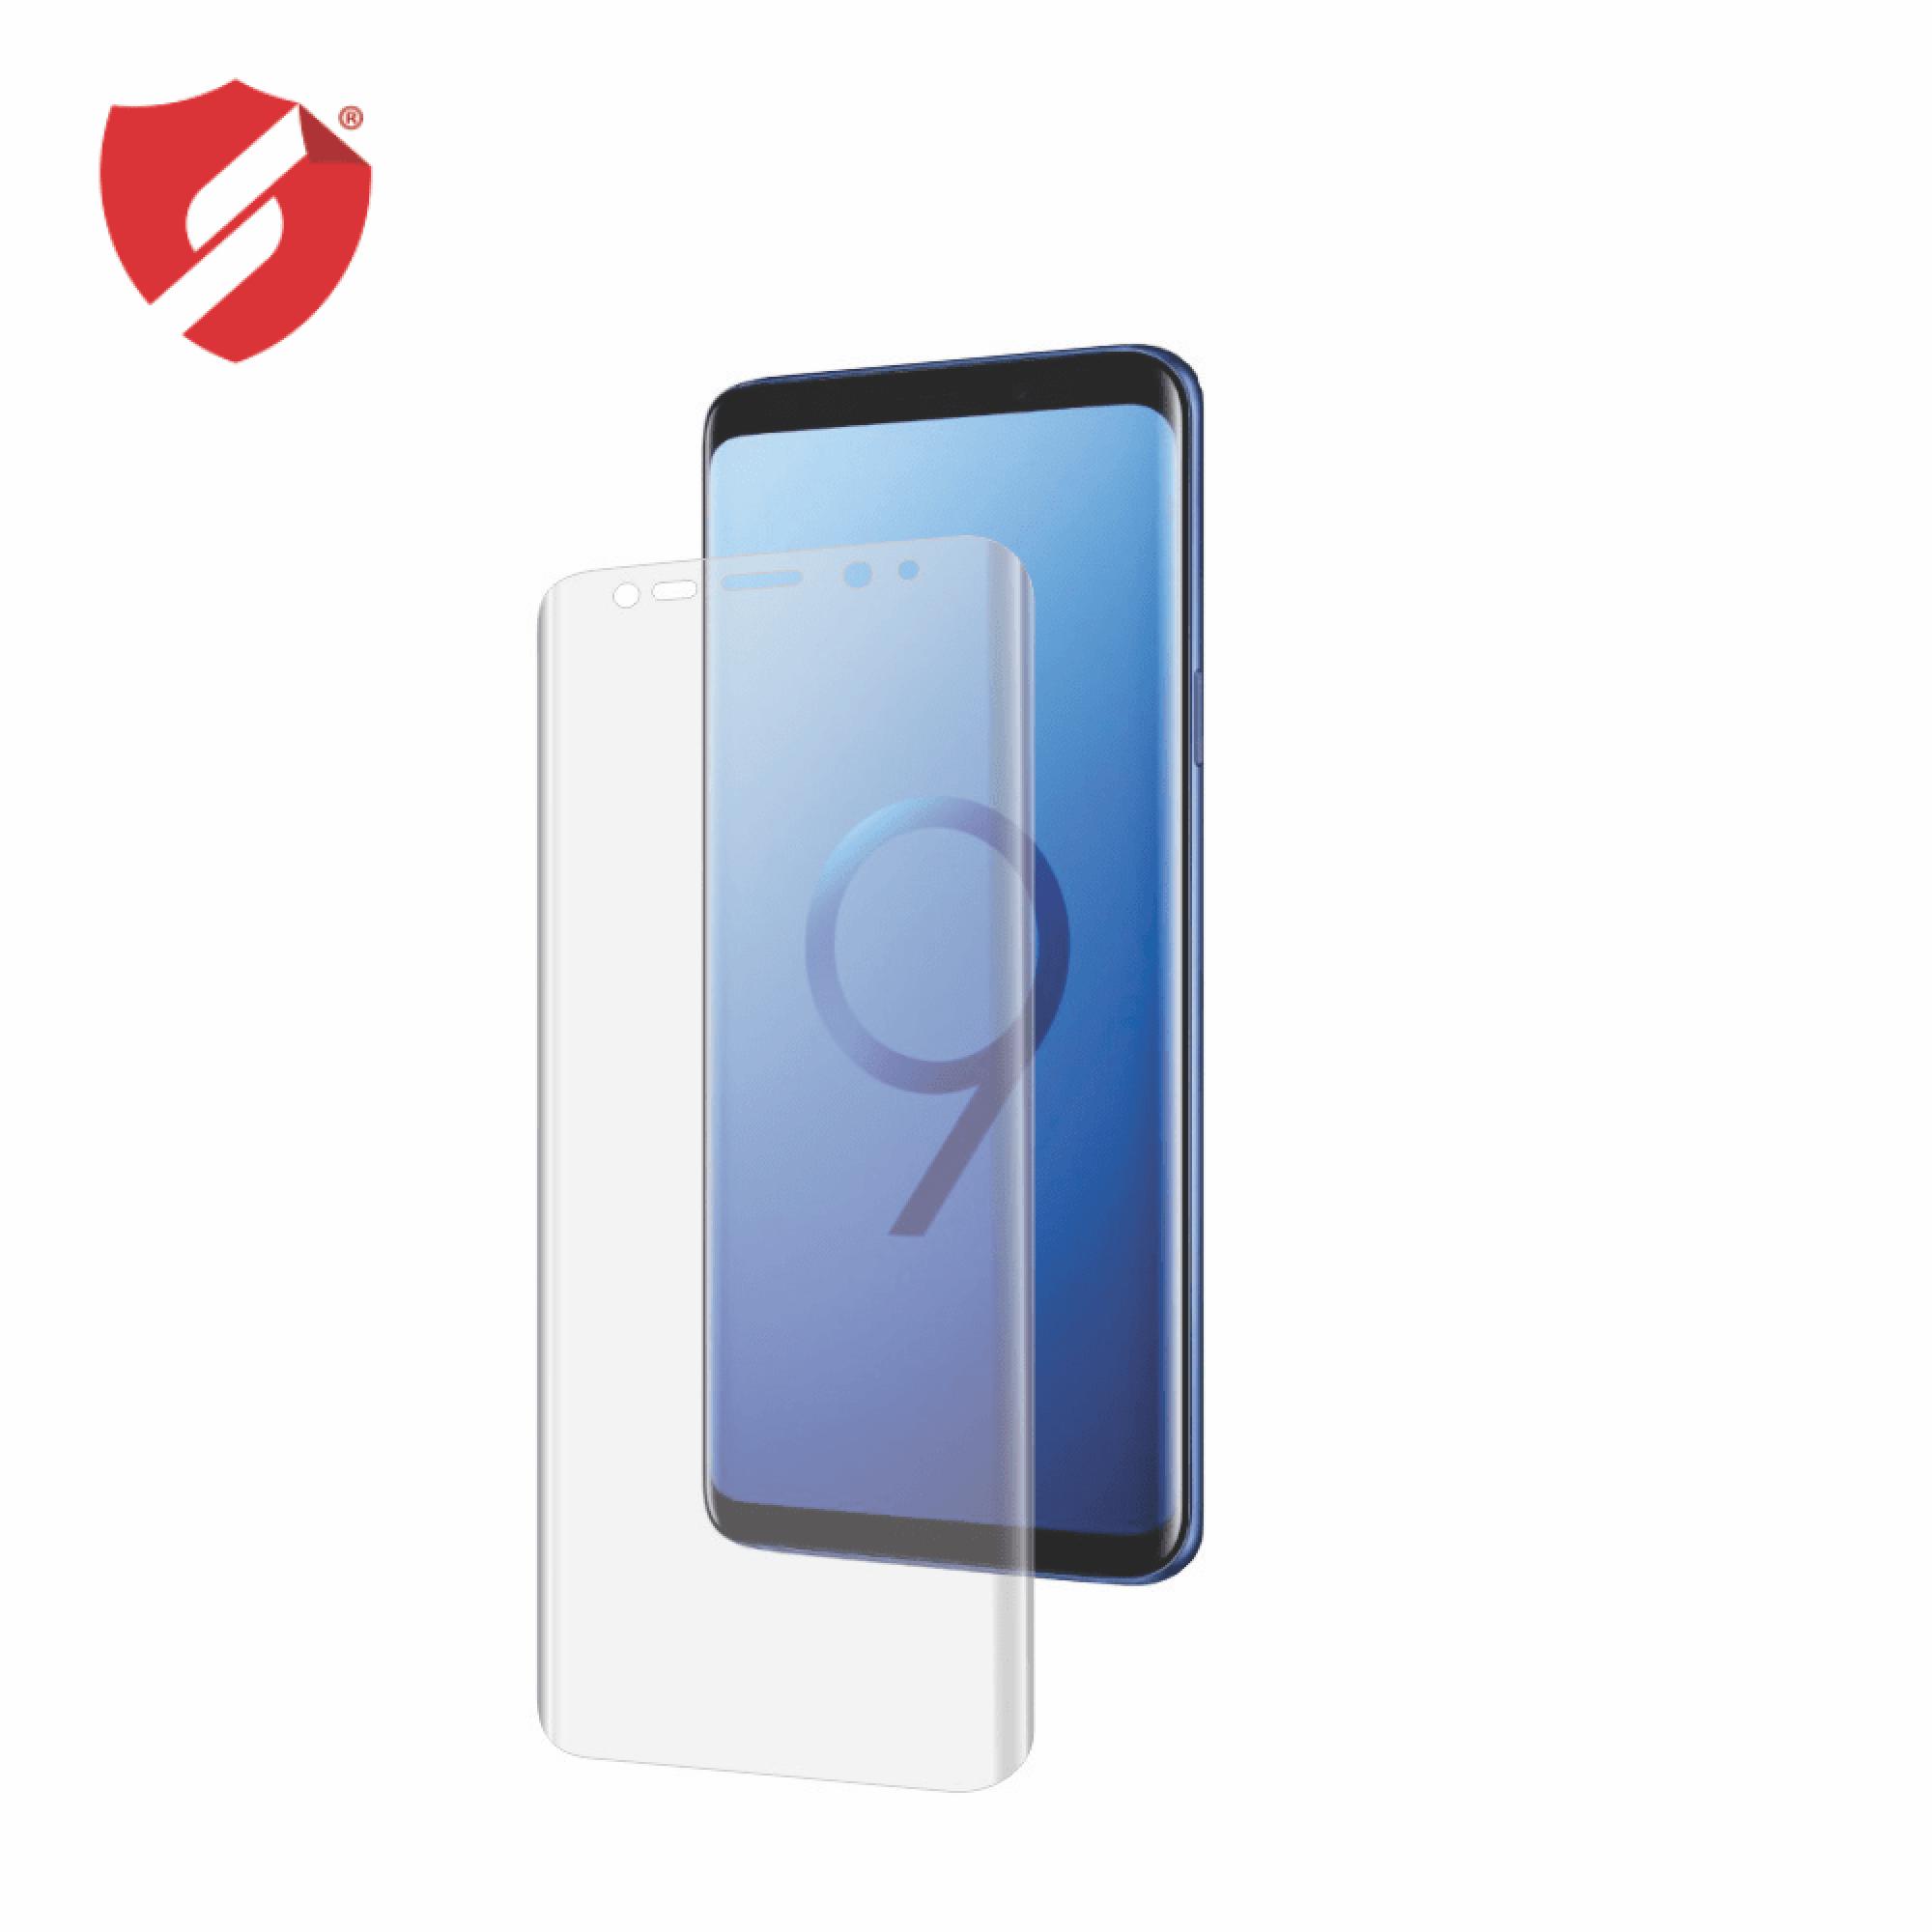 Folie de protectie Smart Protection Samsung Galaxy S9 compatibila cu carcasa Spigen - doar-display imagine